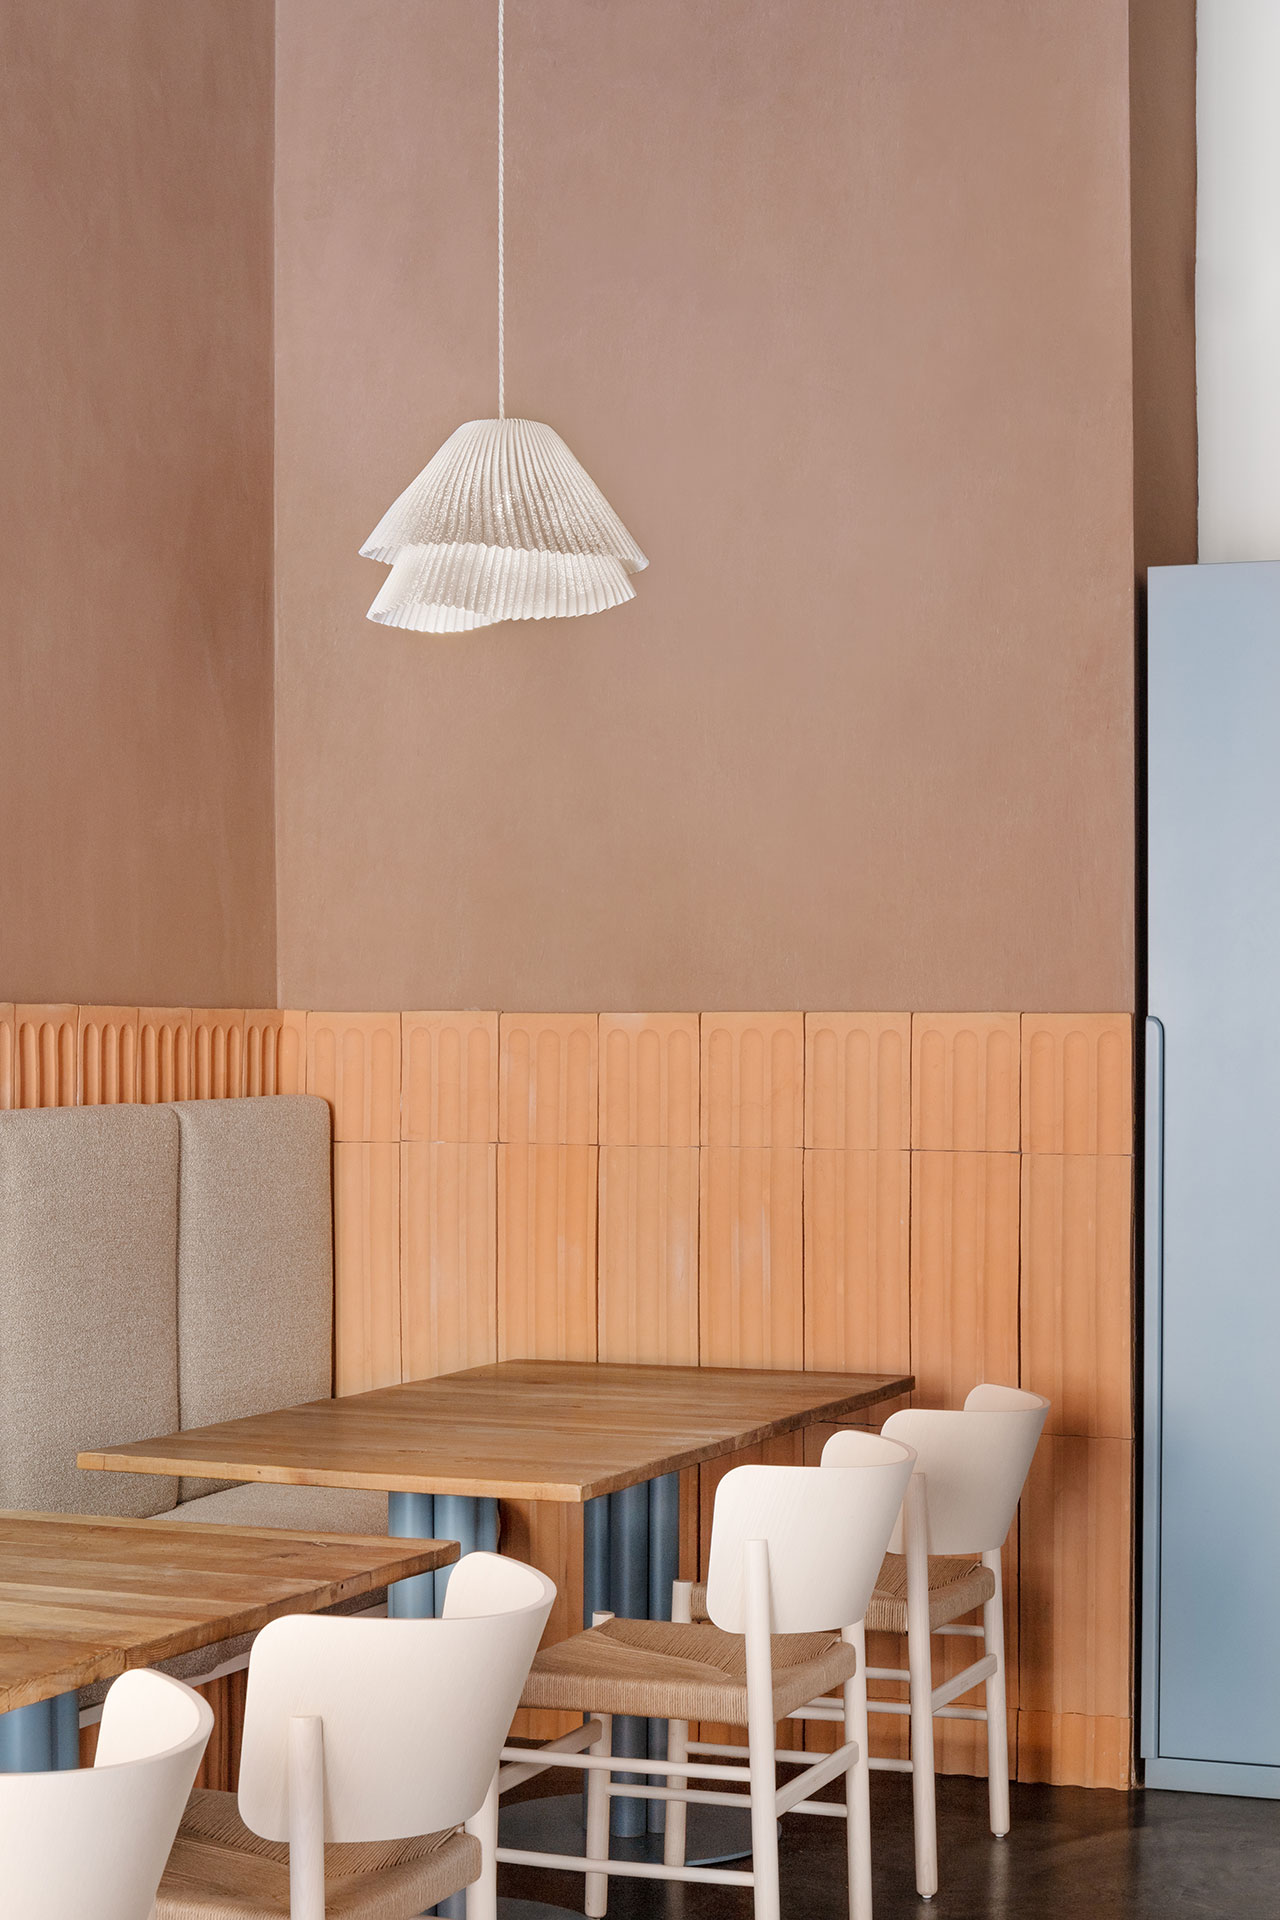 28 Posti restaurant designed byCristina Celestino. PhotoDelfino Sisto Legnani.